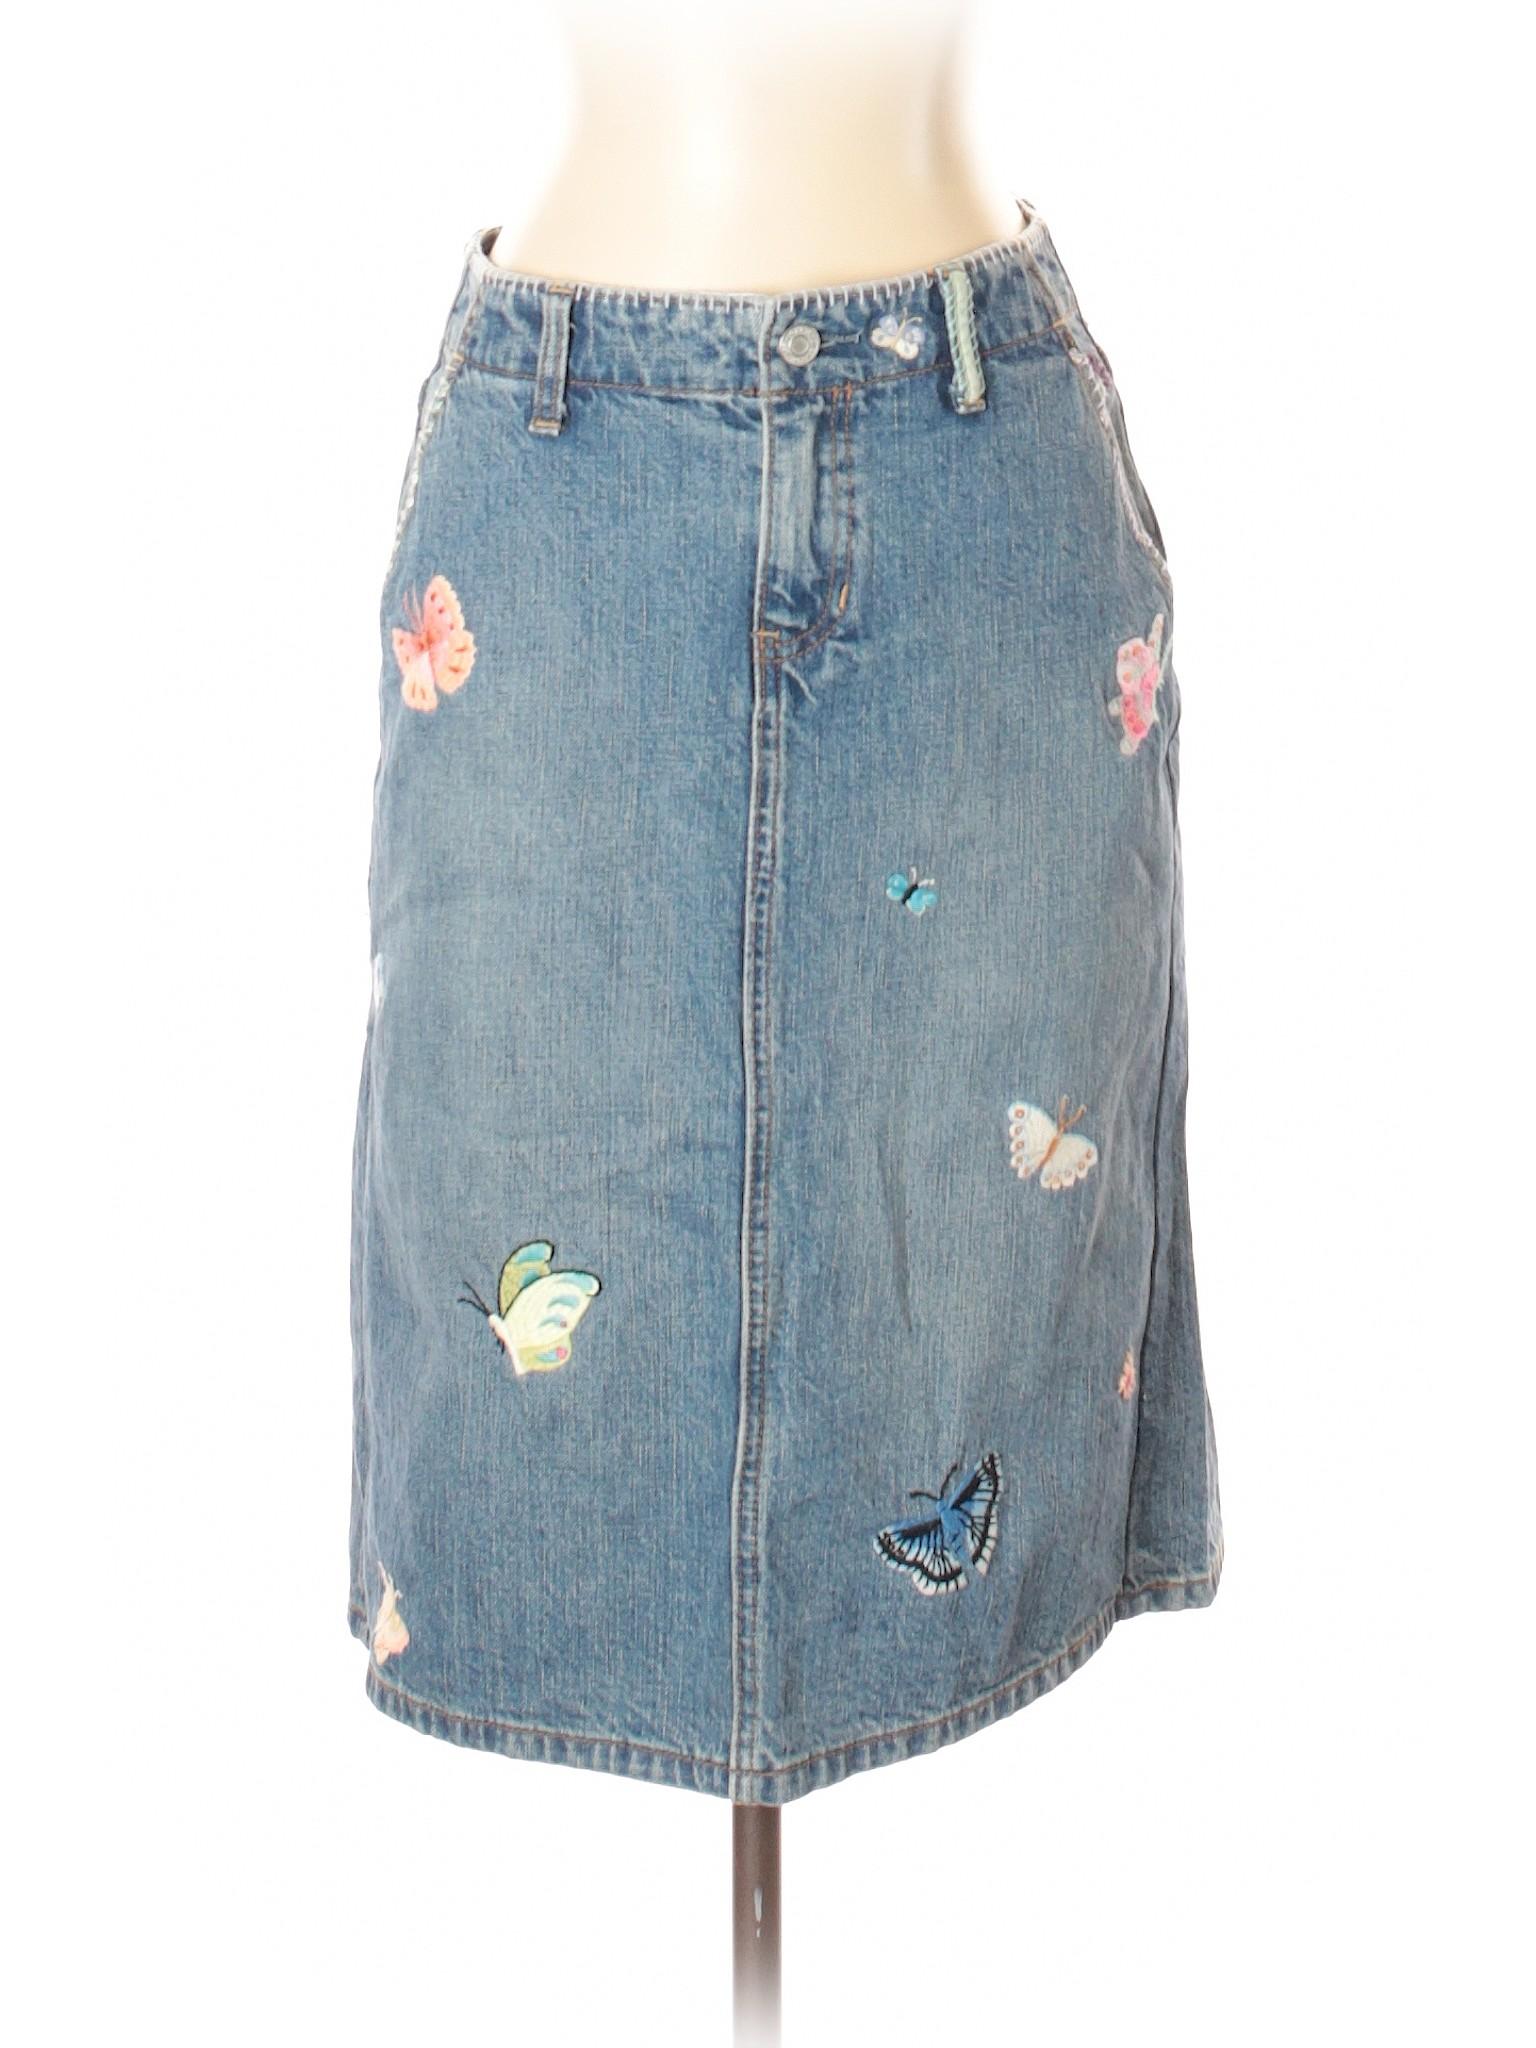 Gap Boutique Boutique Gap Gap Boutique Denim Skirt Skirt Skirt Denim Denim Denim Boutique Gap xfwfqZPnBS